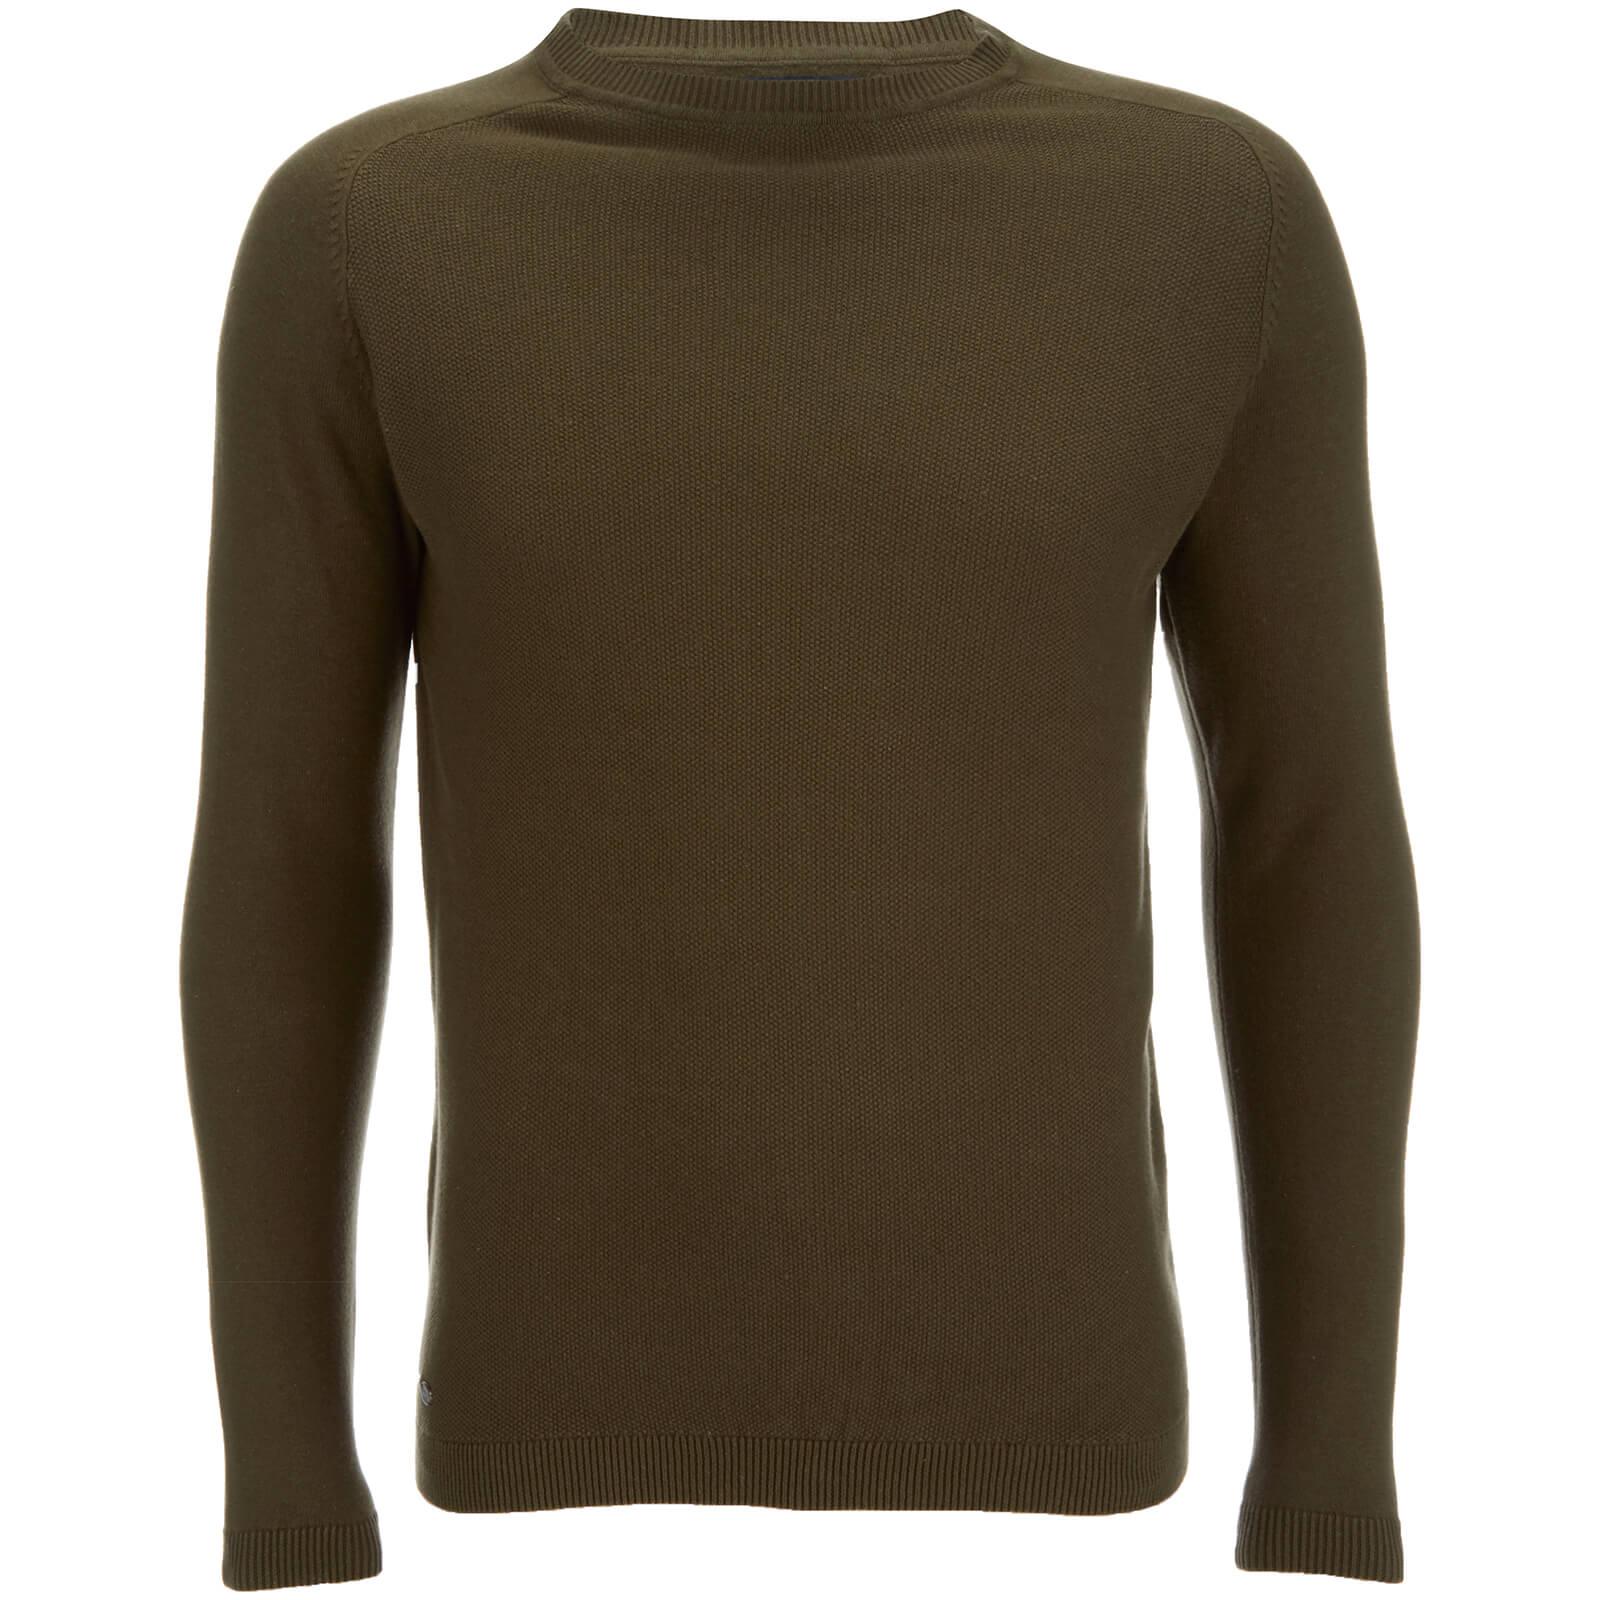 ae150e3a1 Kensington Eastside Men s Henry Cotton Crew Neck Jumper - Khaki Mens  Clothing